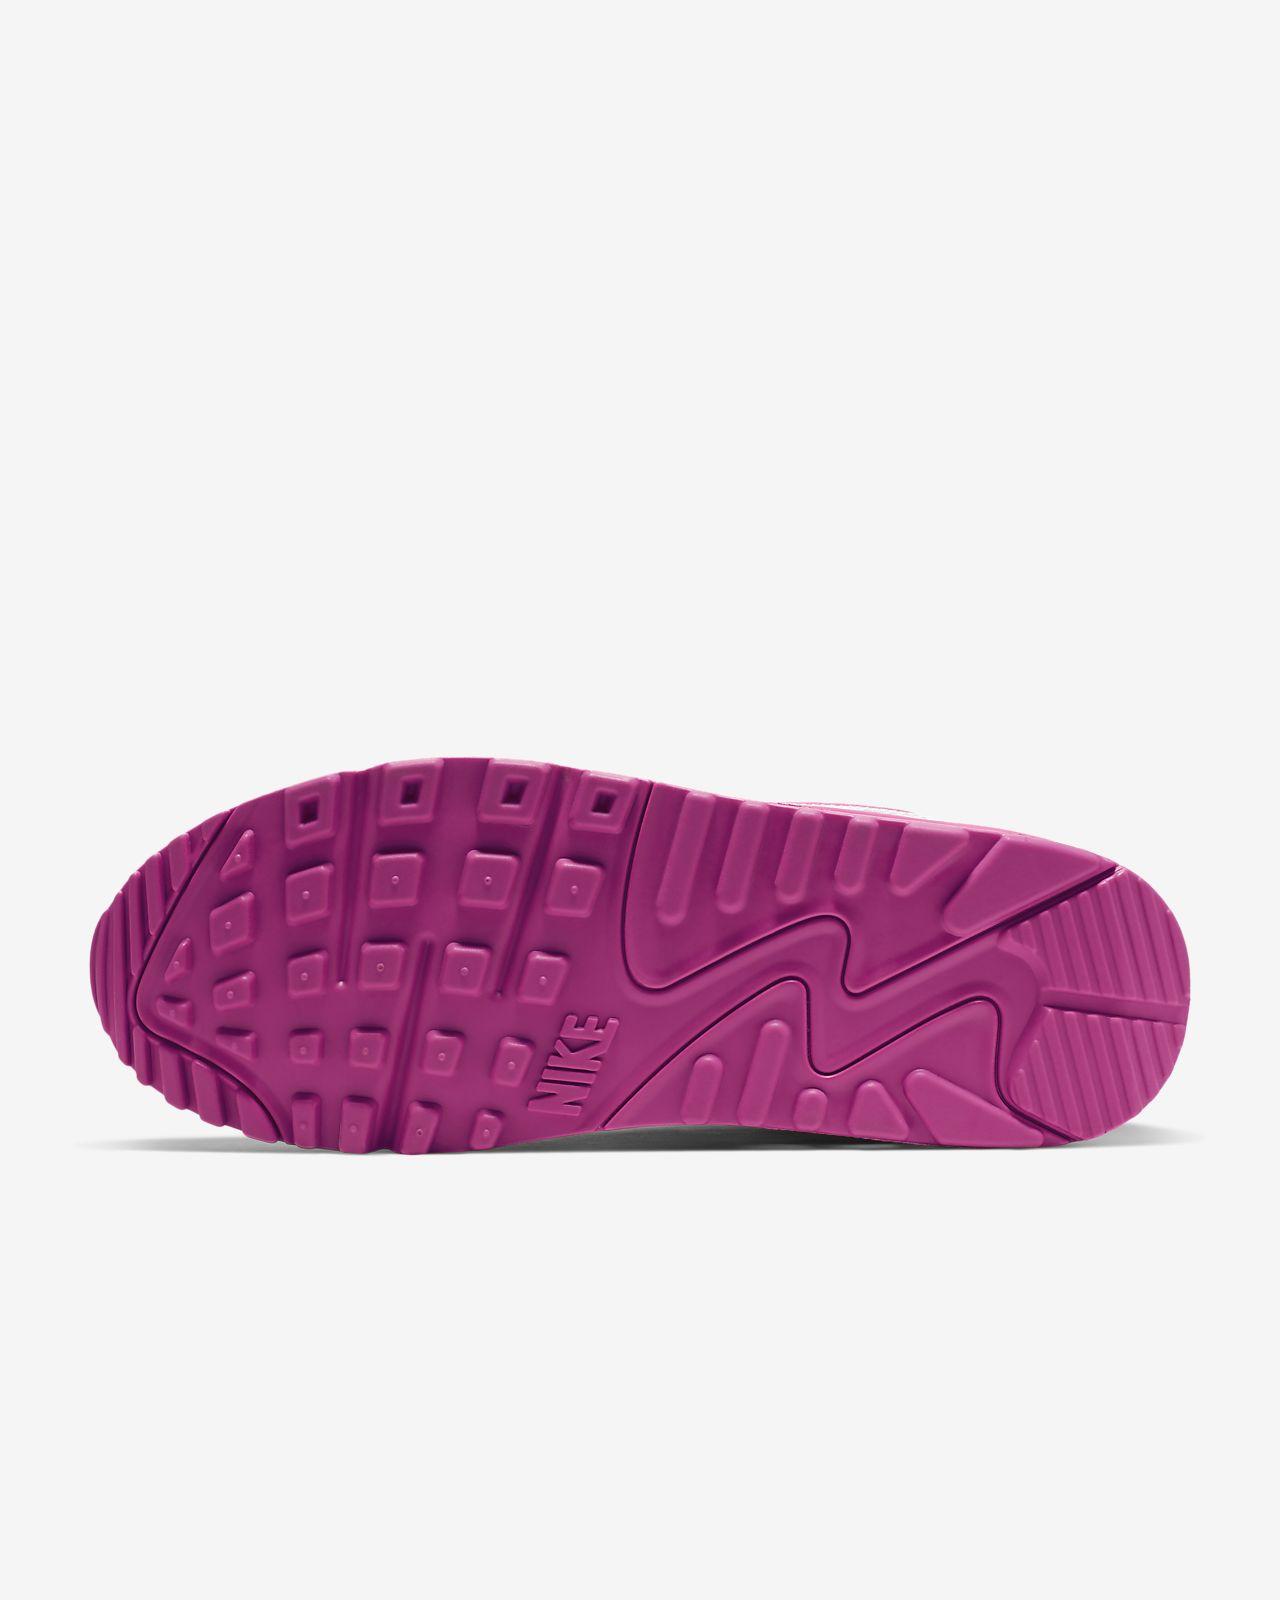 online retailer 59743 2daf1 Nike Air Max 90 Women's Shoe. Nike.com VN